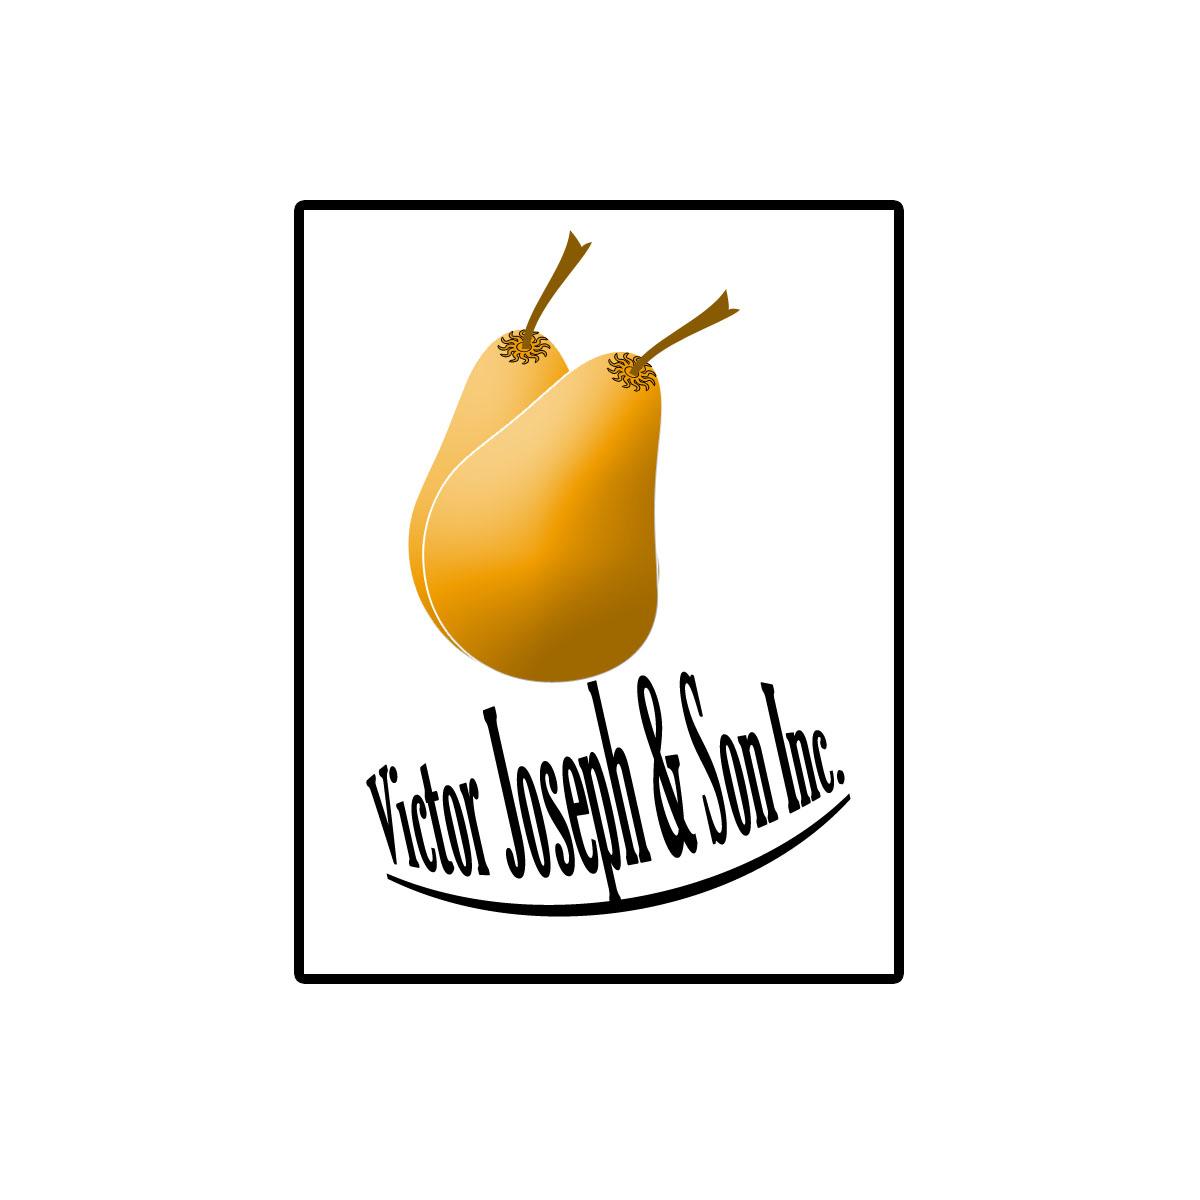 Logo Design by Moag - Entry No. 213 in the Logo Design Contest Imaginative Logo Design for Victor Joseph & Son, Inc..